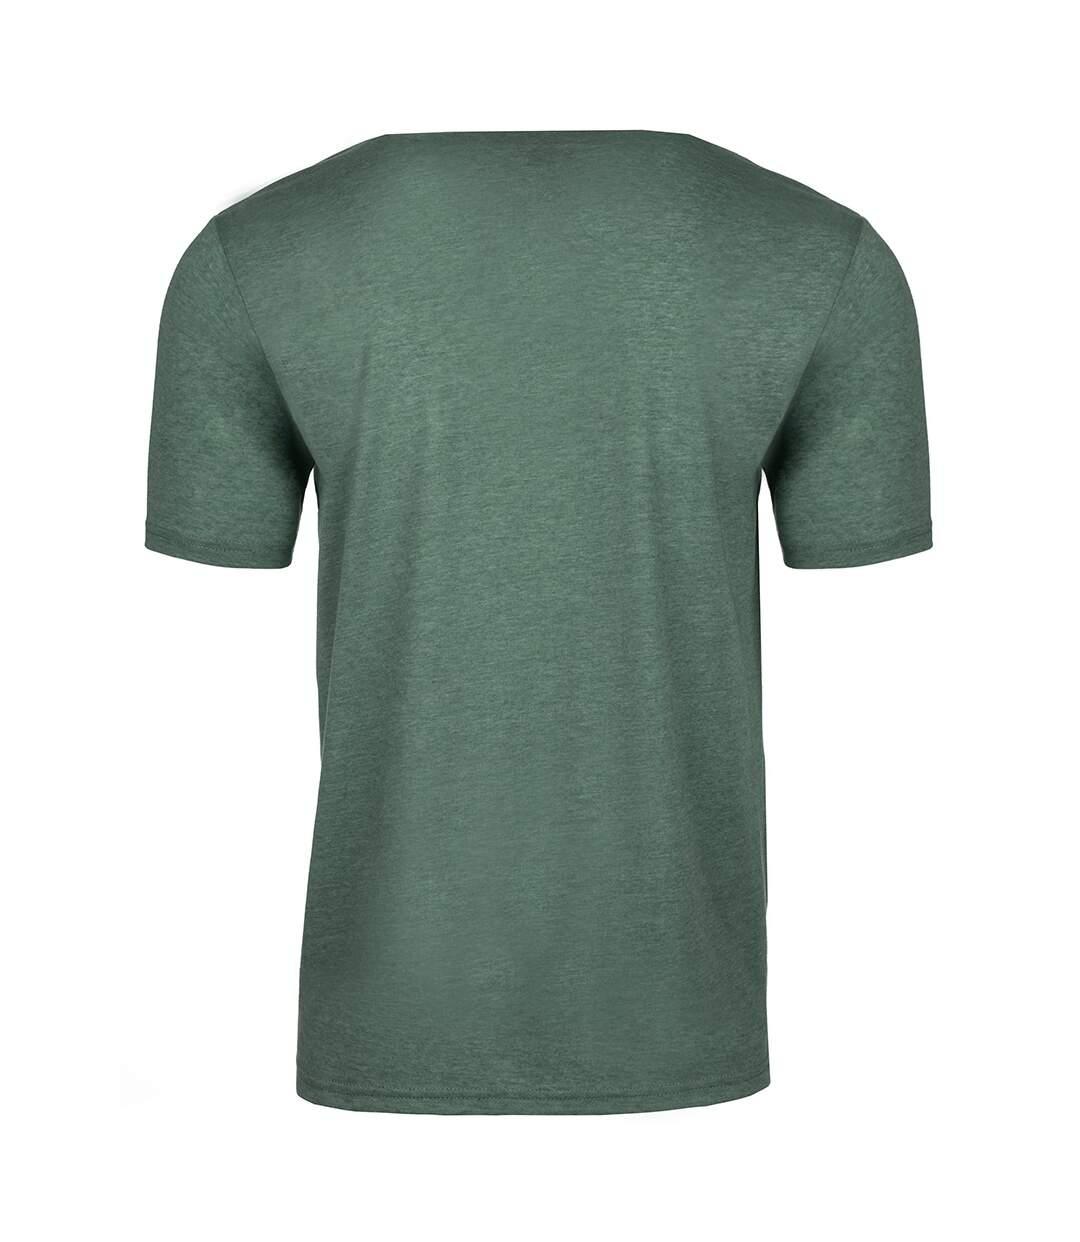 Next Level Mens Short-Sleeved T-Shirt (Royal Pine) - UTPC4182